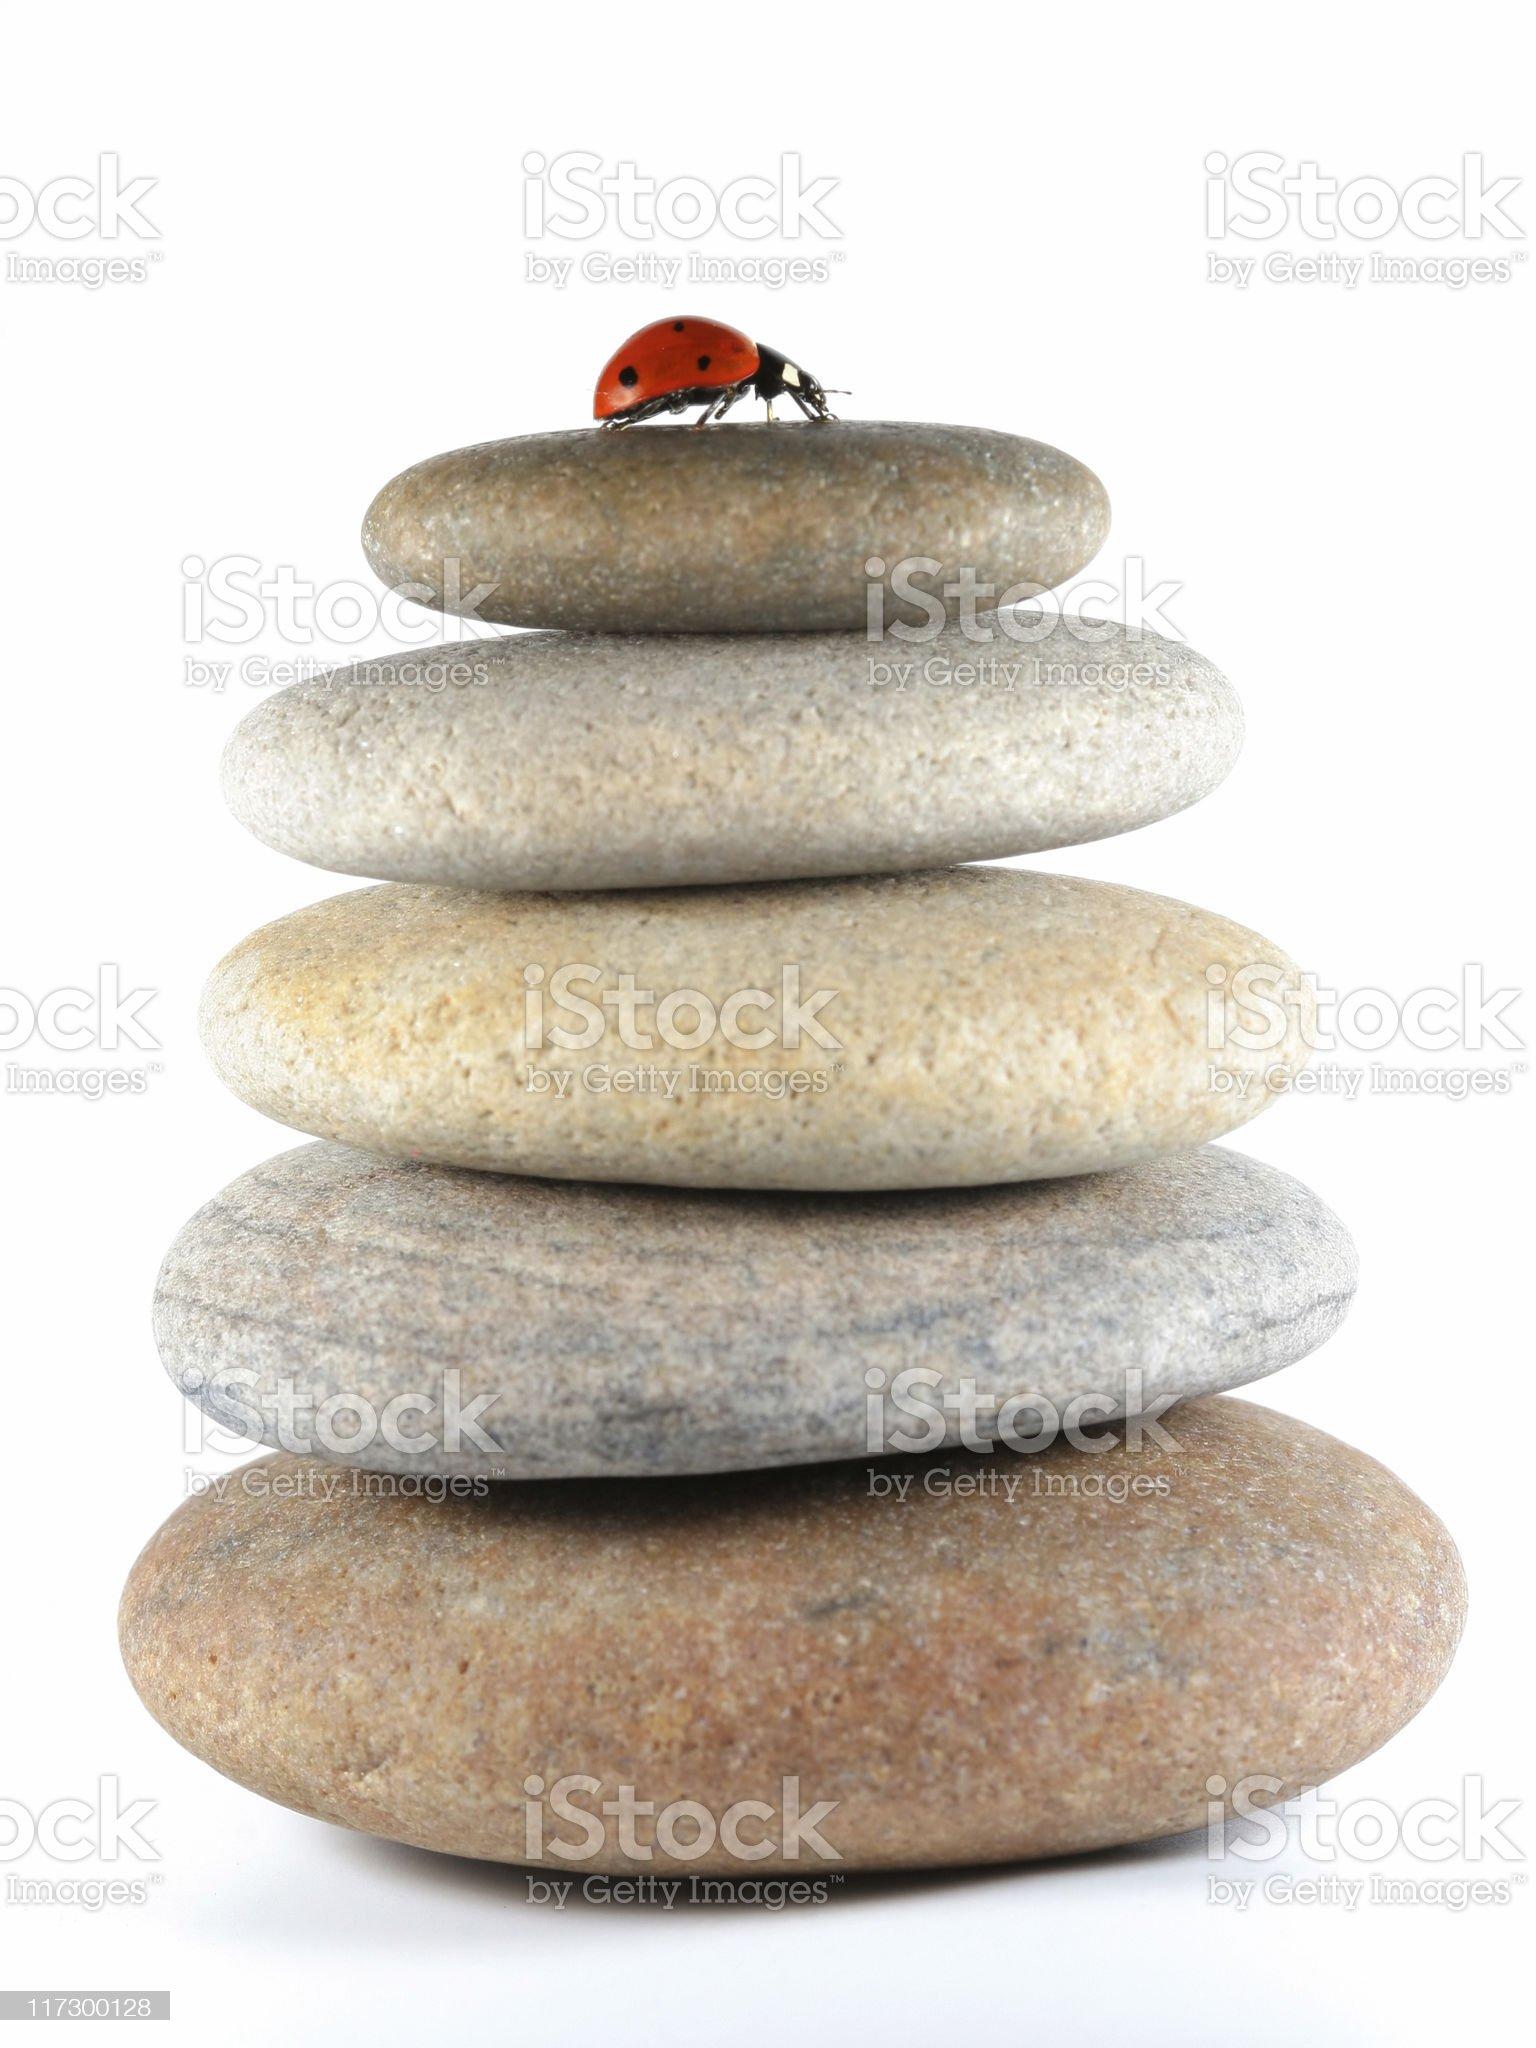 Ladybug and pebbles stack royalty-free stock photo